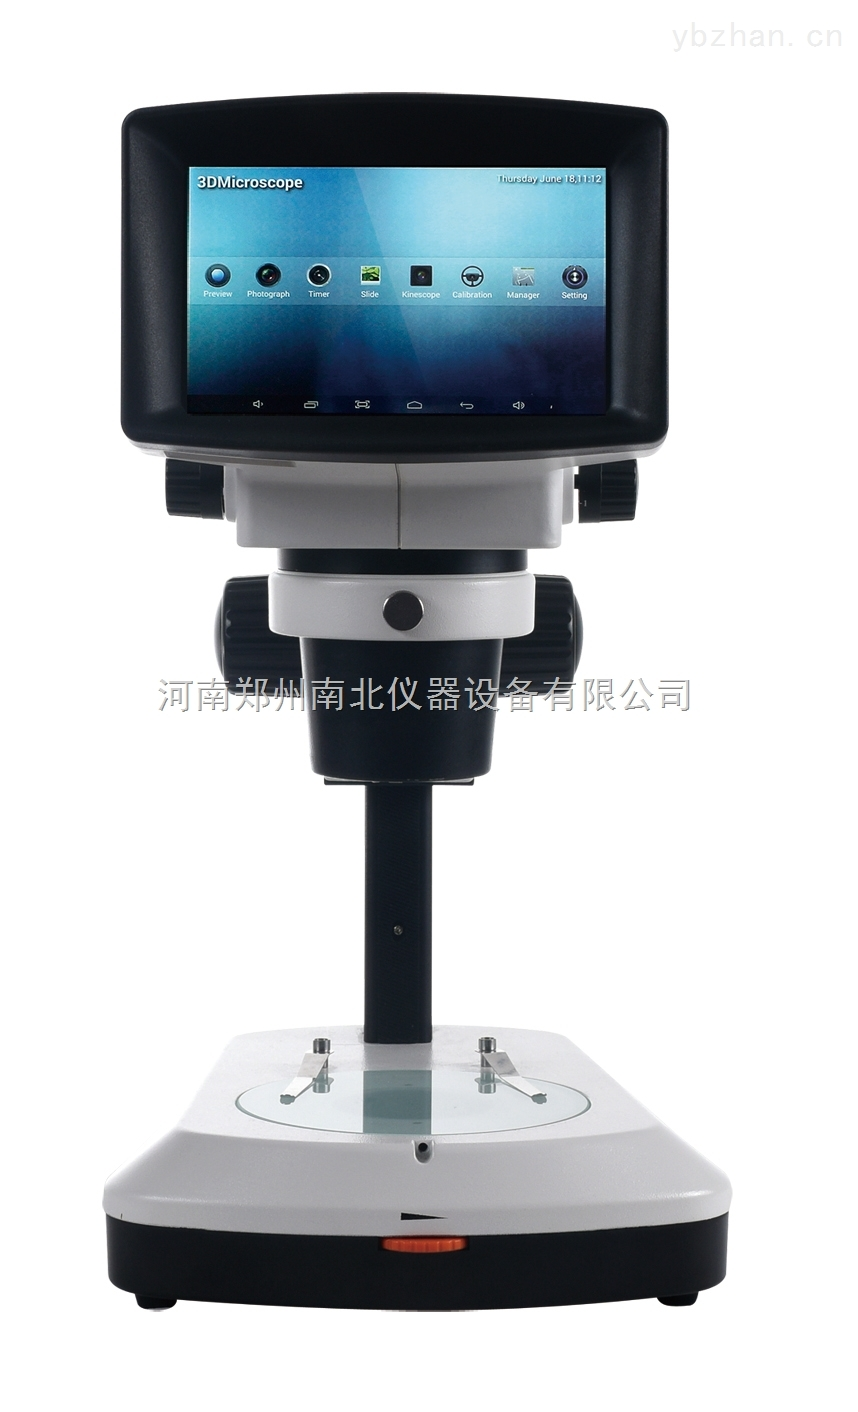 裸眼3D立体显微镜厂家